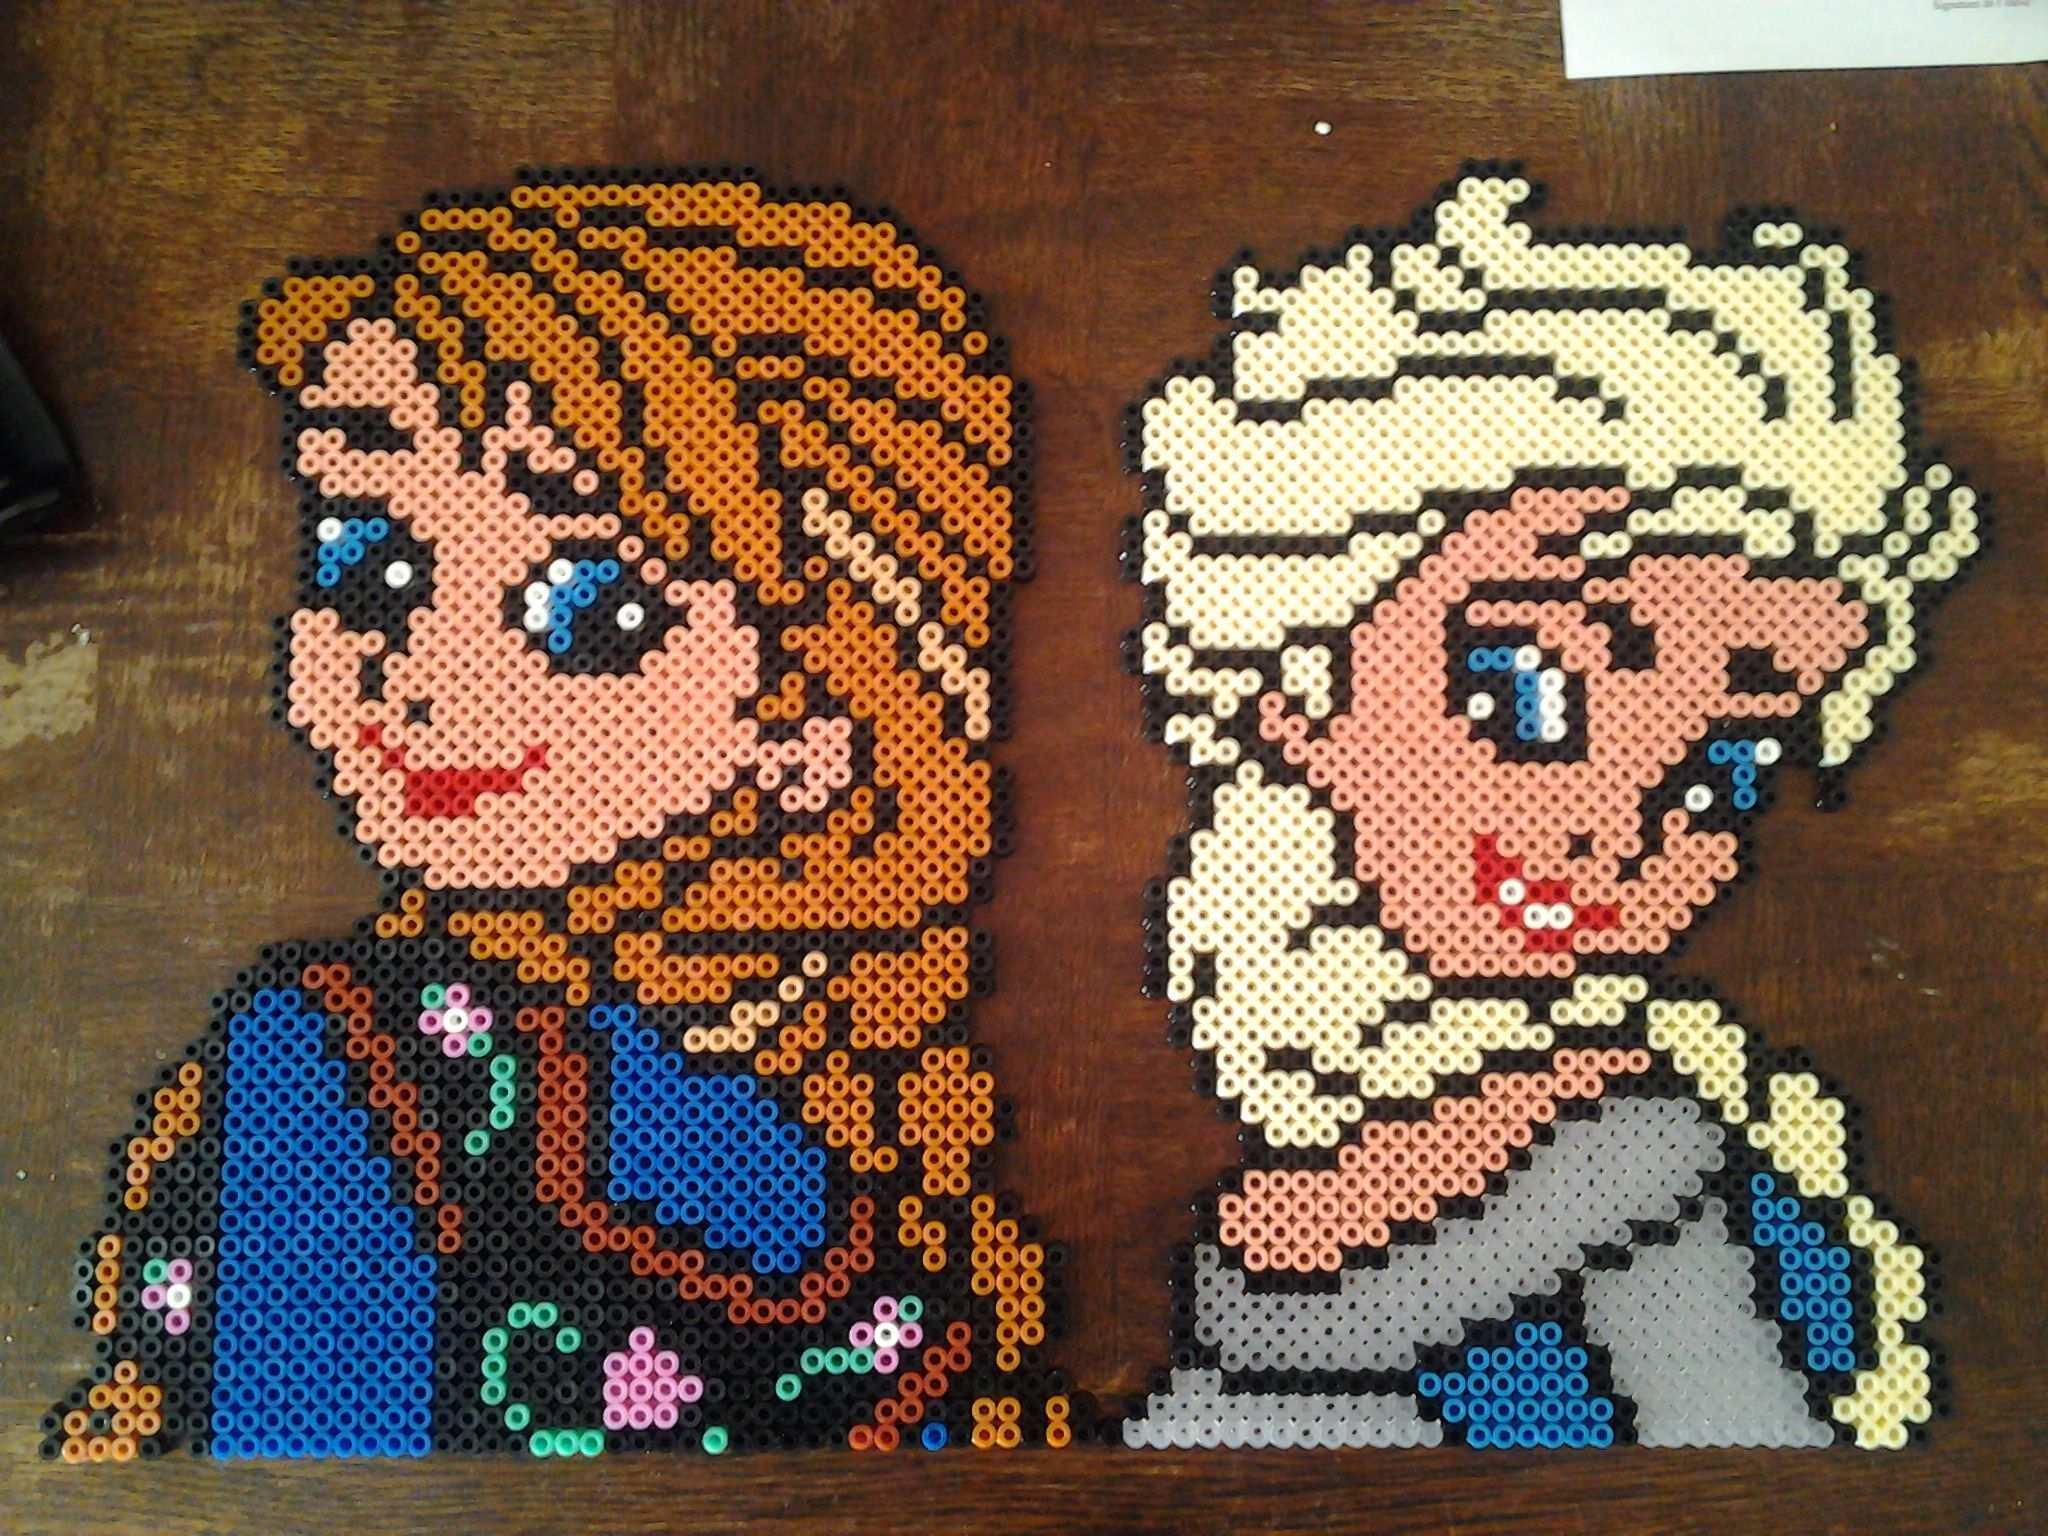 Anna And Elsa Frozen Hama Perler Beads By Marie Kli Perlemonstre Korssting Broderi Hobbyarbejde